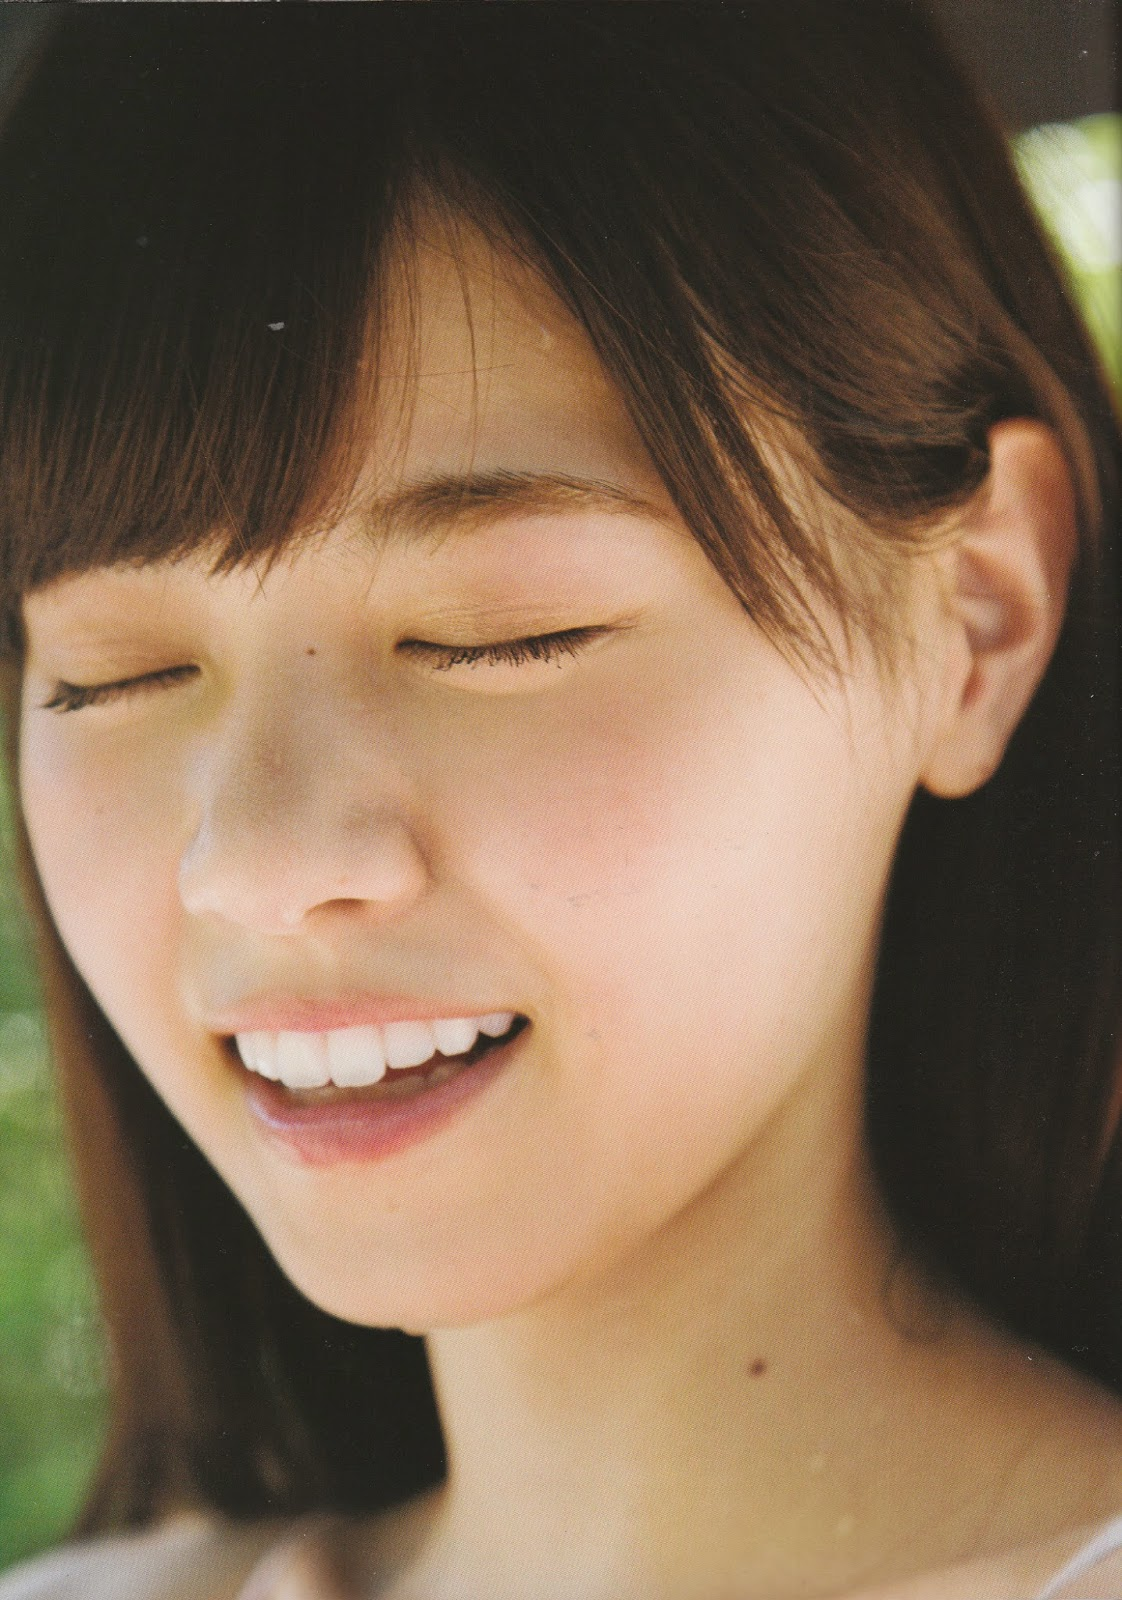 Nishino Nanase 1st Photobook - Fudangi | VOZ48 Mirror